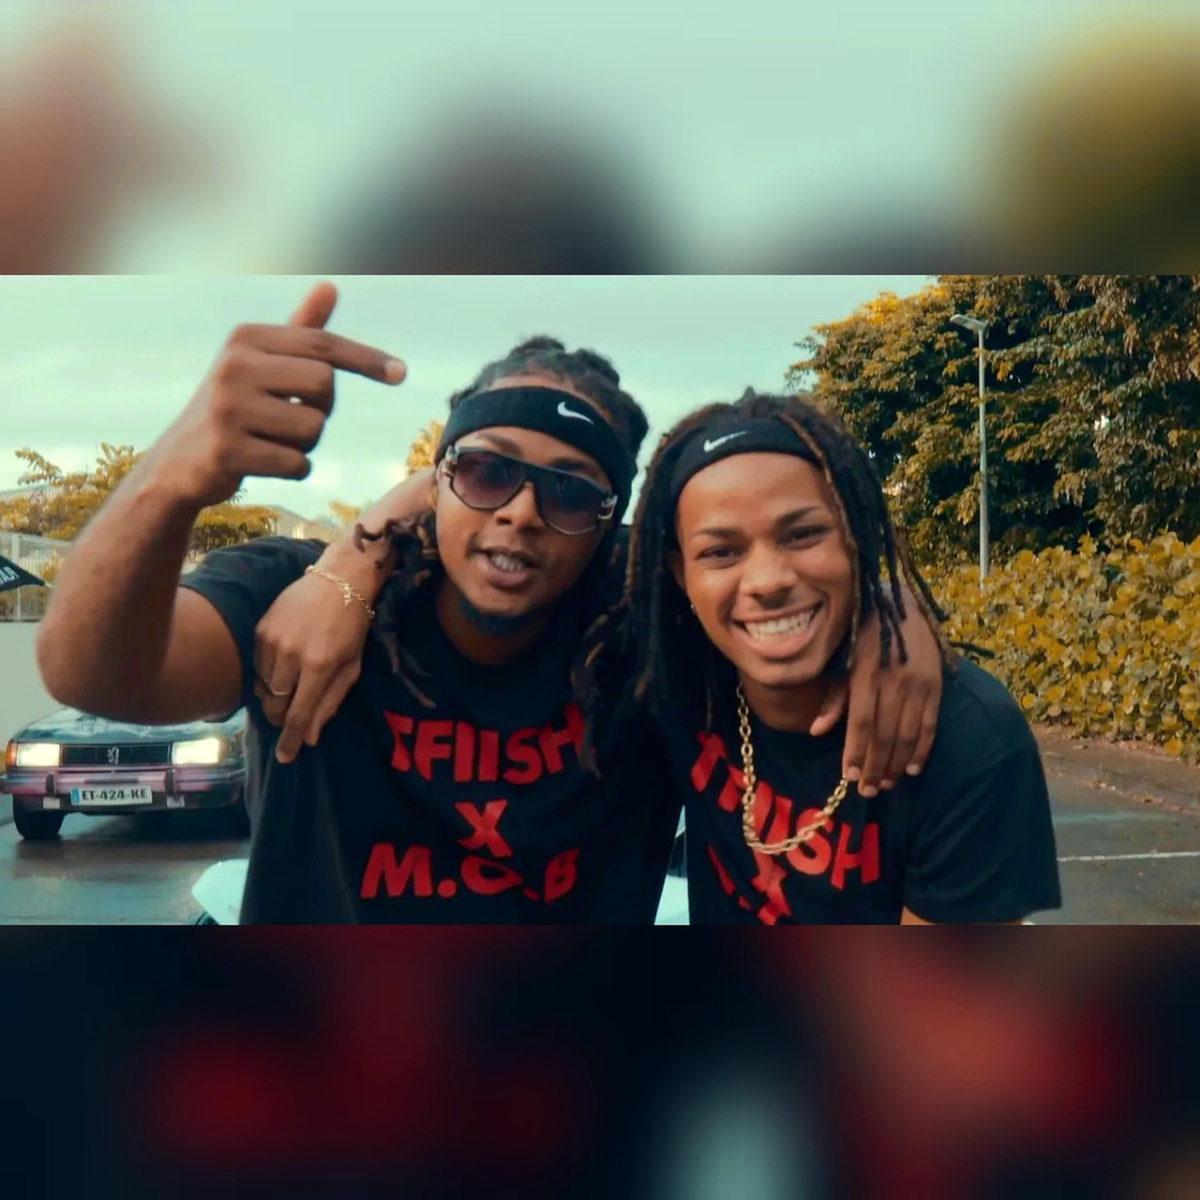 M.O.B and DJ Tfiish - La Choré Des Shattas (Cover)